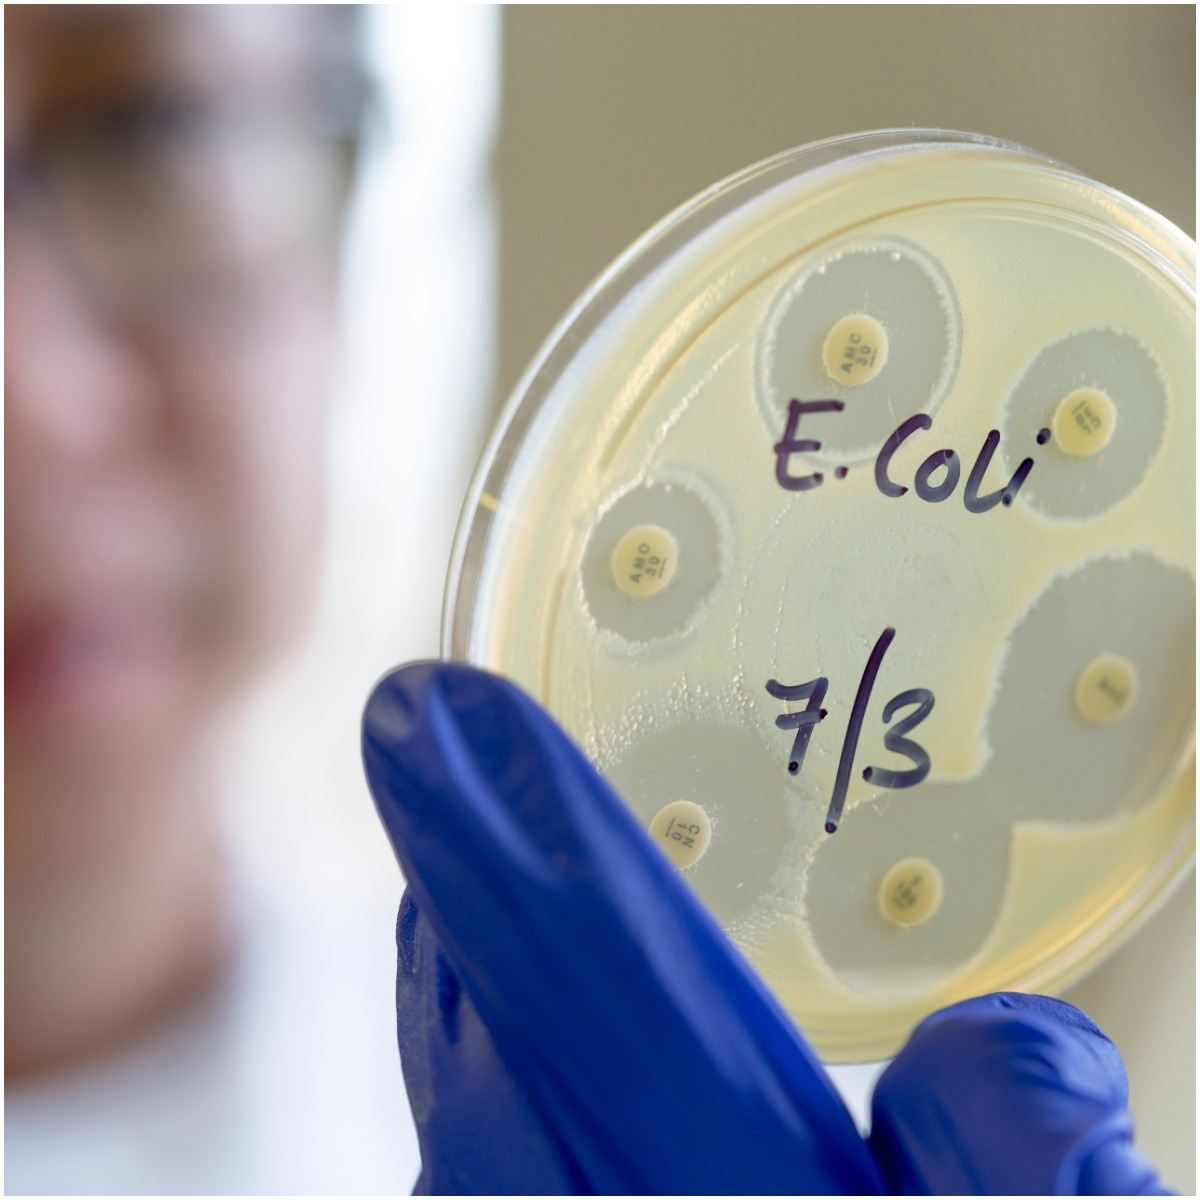 Facts About E. Coli SYMPTOMS